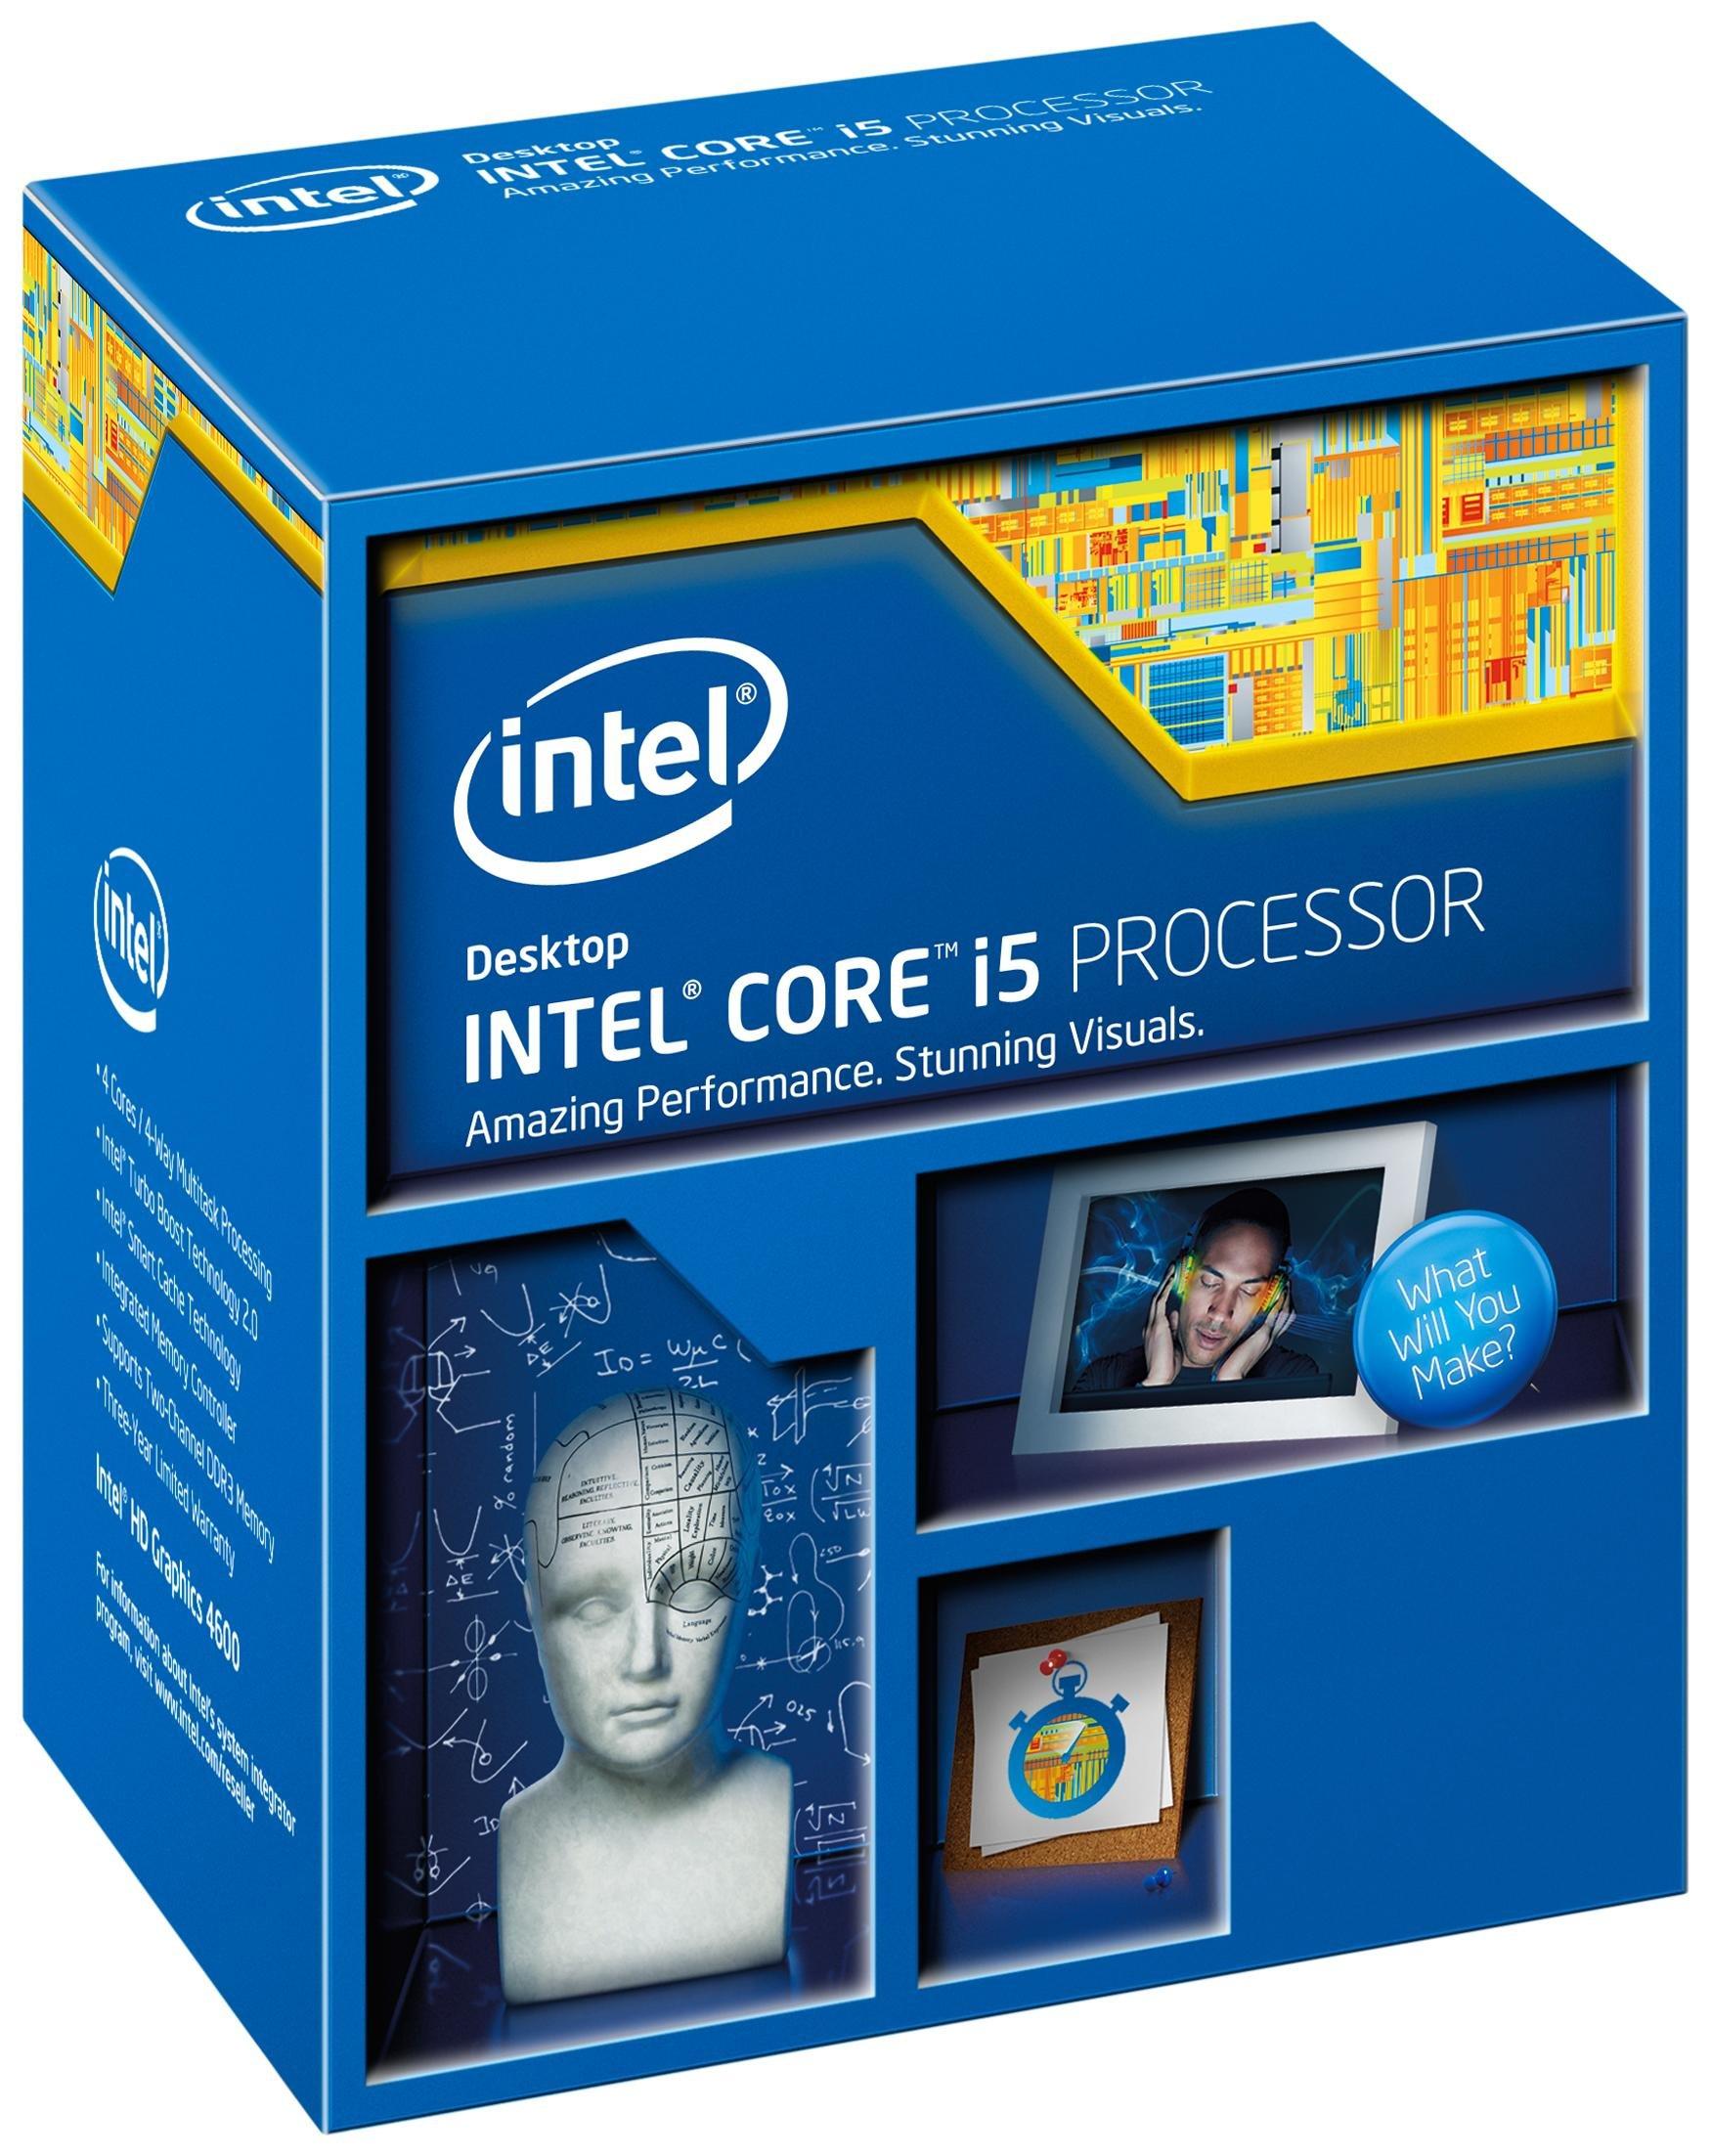 Intel Core i5-4460 LGA 1150 CPU - BX80646I54460 by Intel